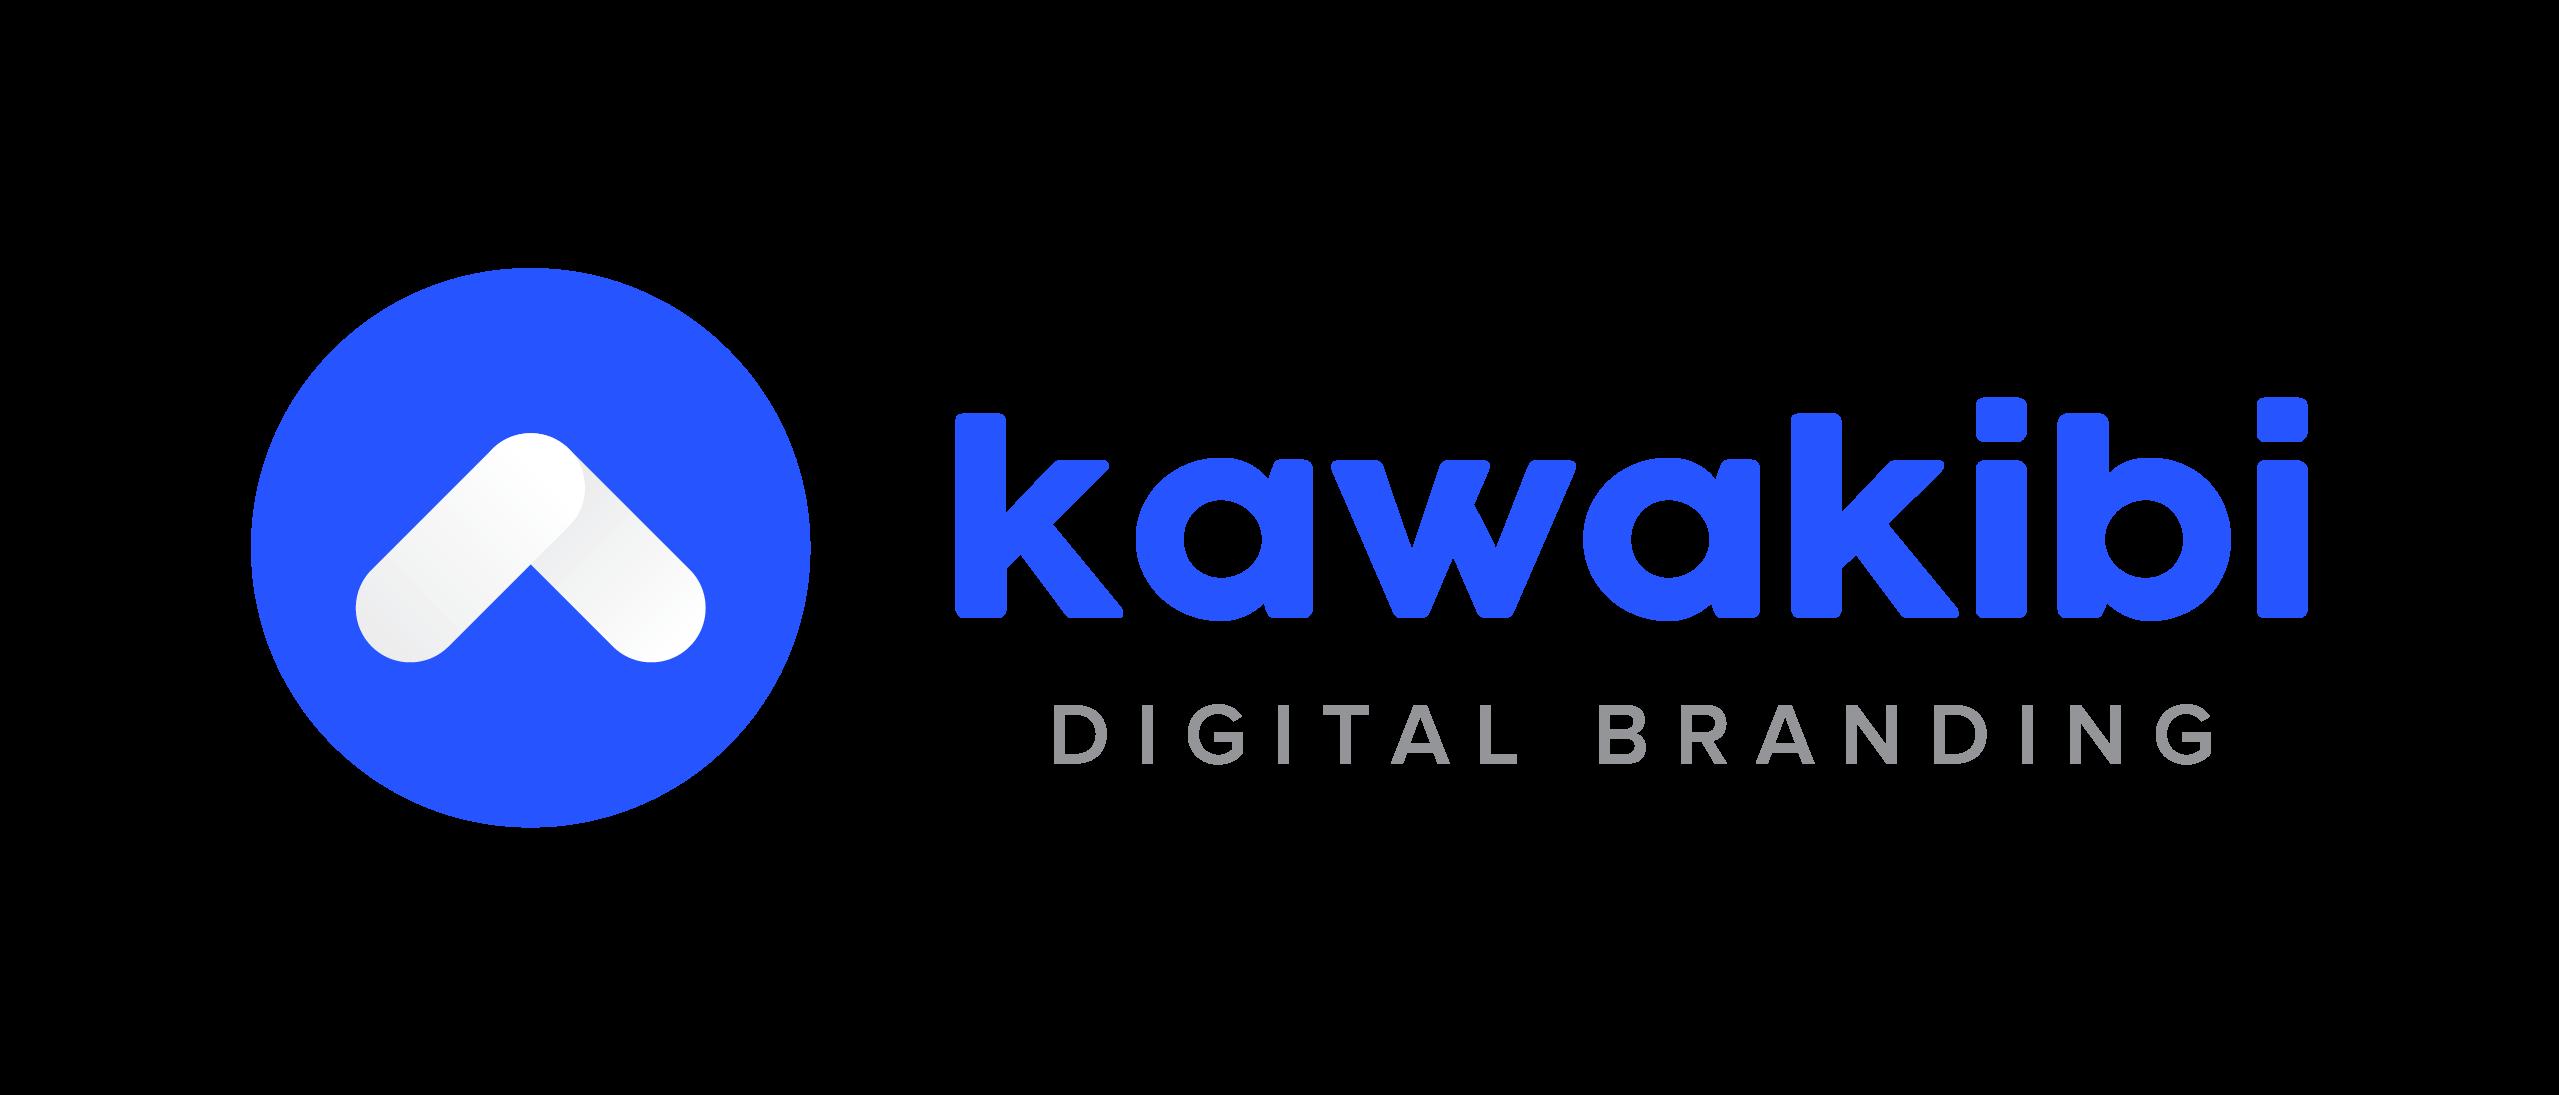 Kawakibi - Digital Branding & Marketing